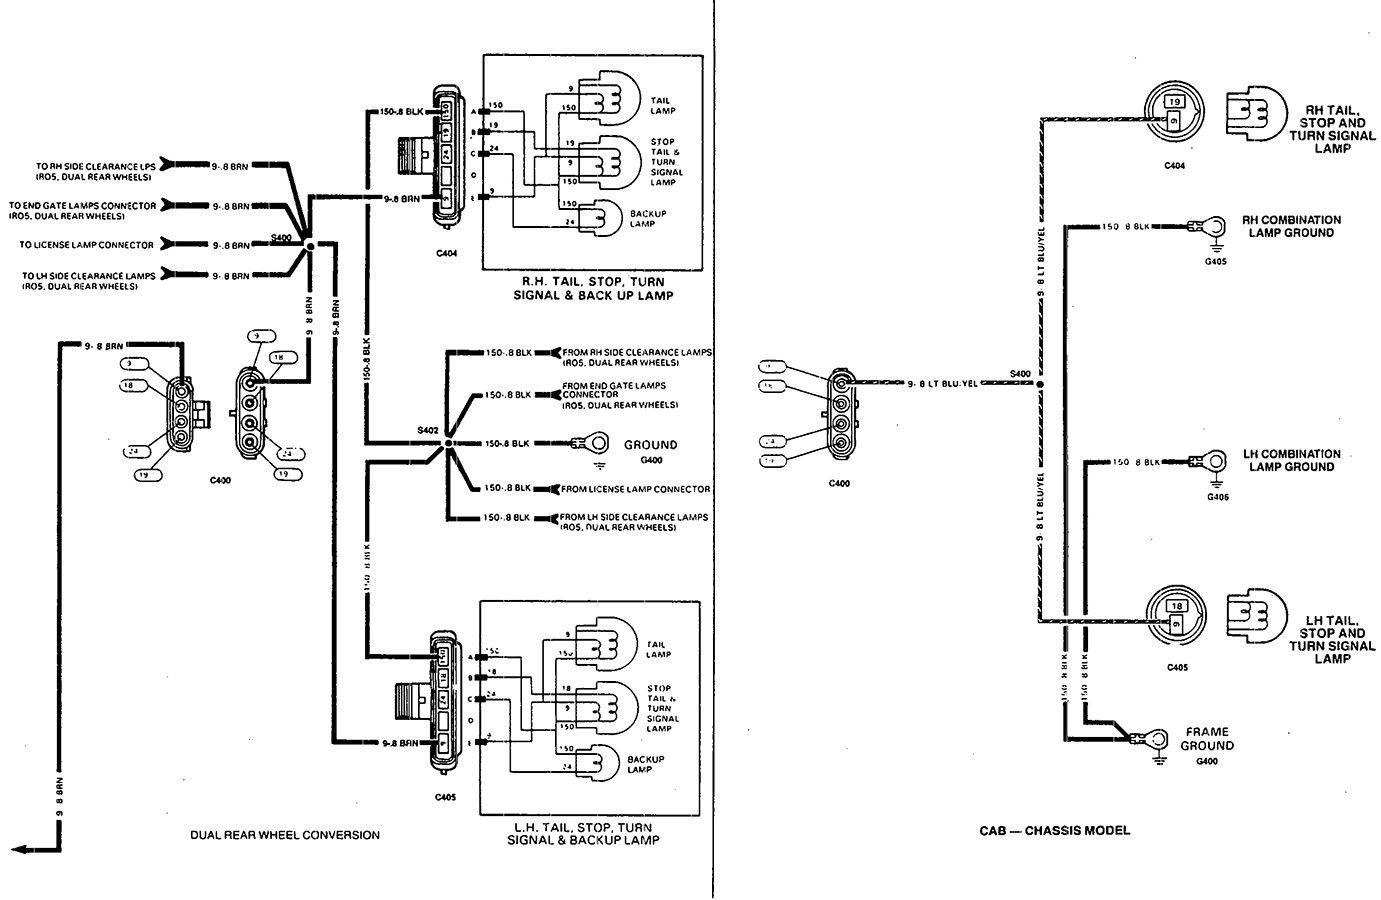 2011 Chevy Silverado 4 Door Brake Light Wiring Diagram 2003 Trailblazer Tail Light Circuit Diagram Awesome In 2020